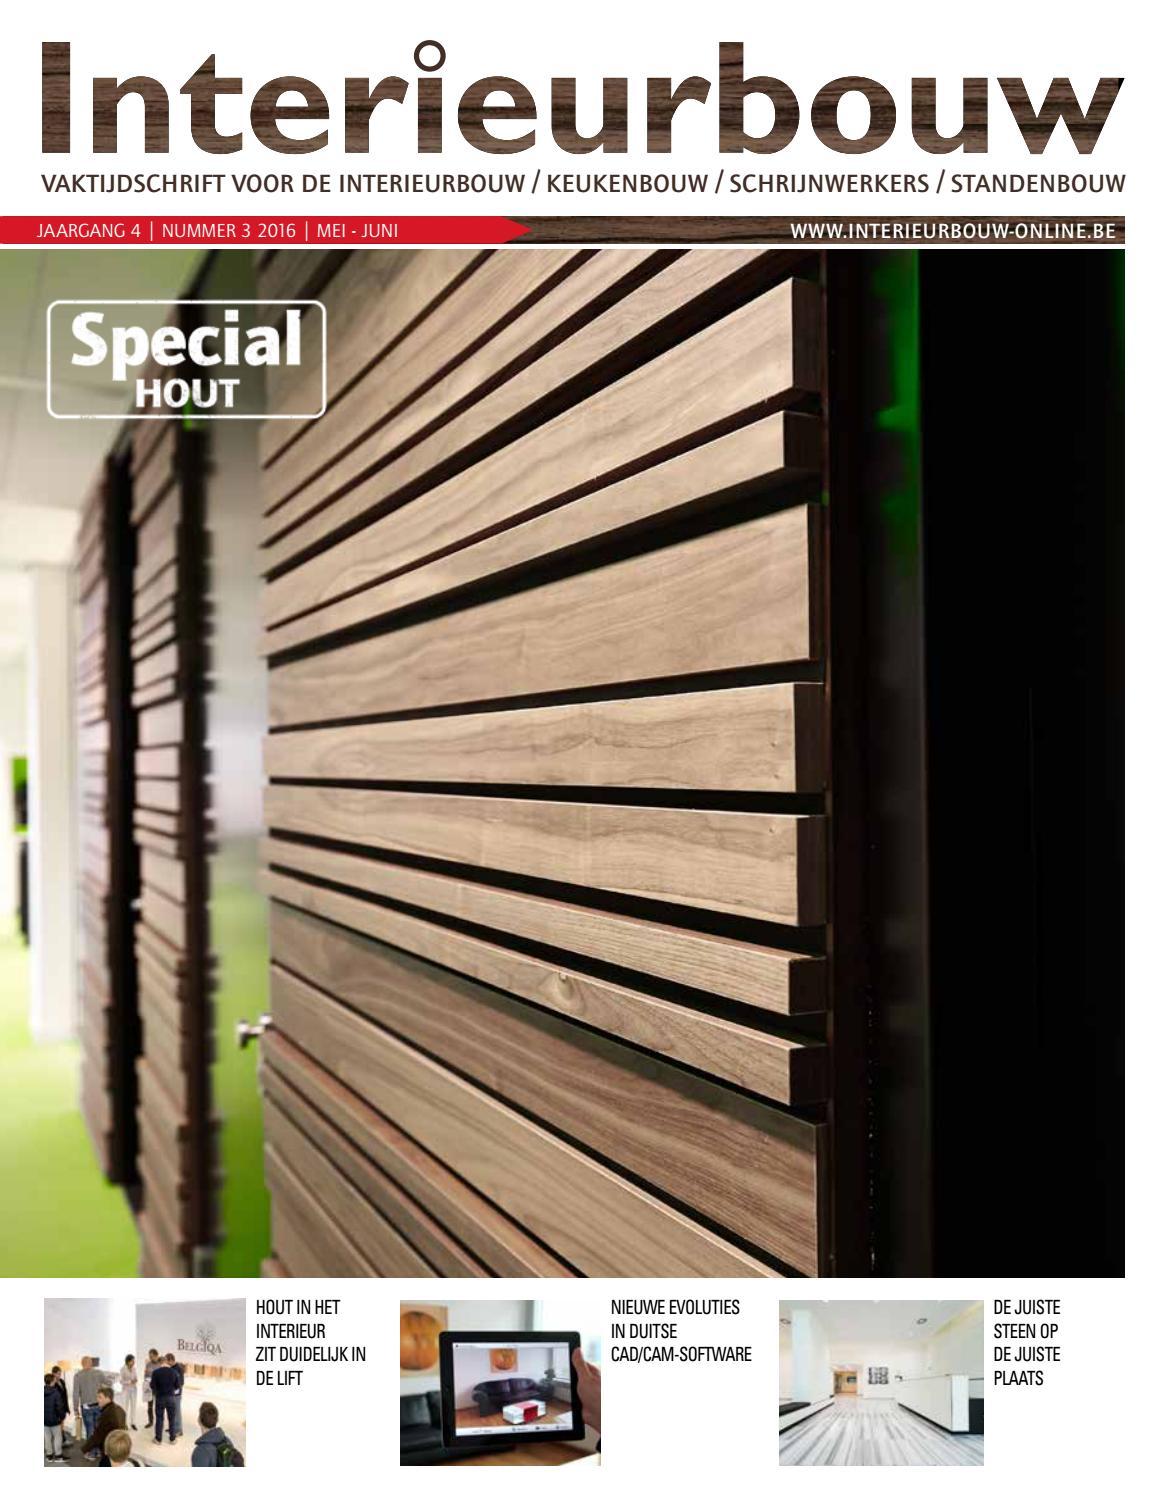 Interieurbouw 03 2016 by louwers uitgeversorganisatie bv   issuu